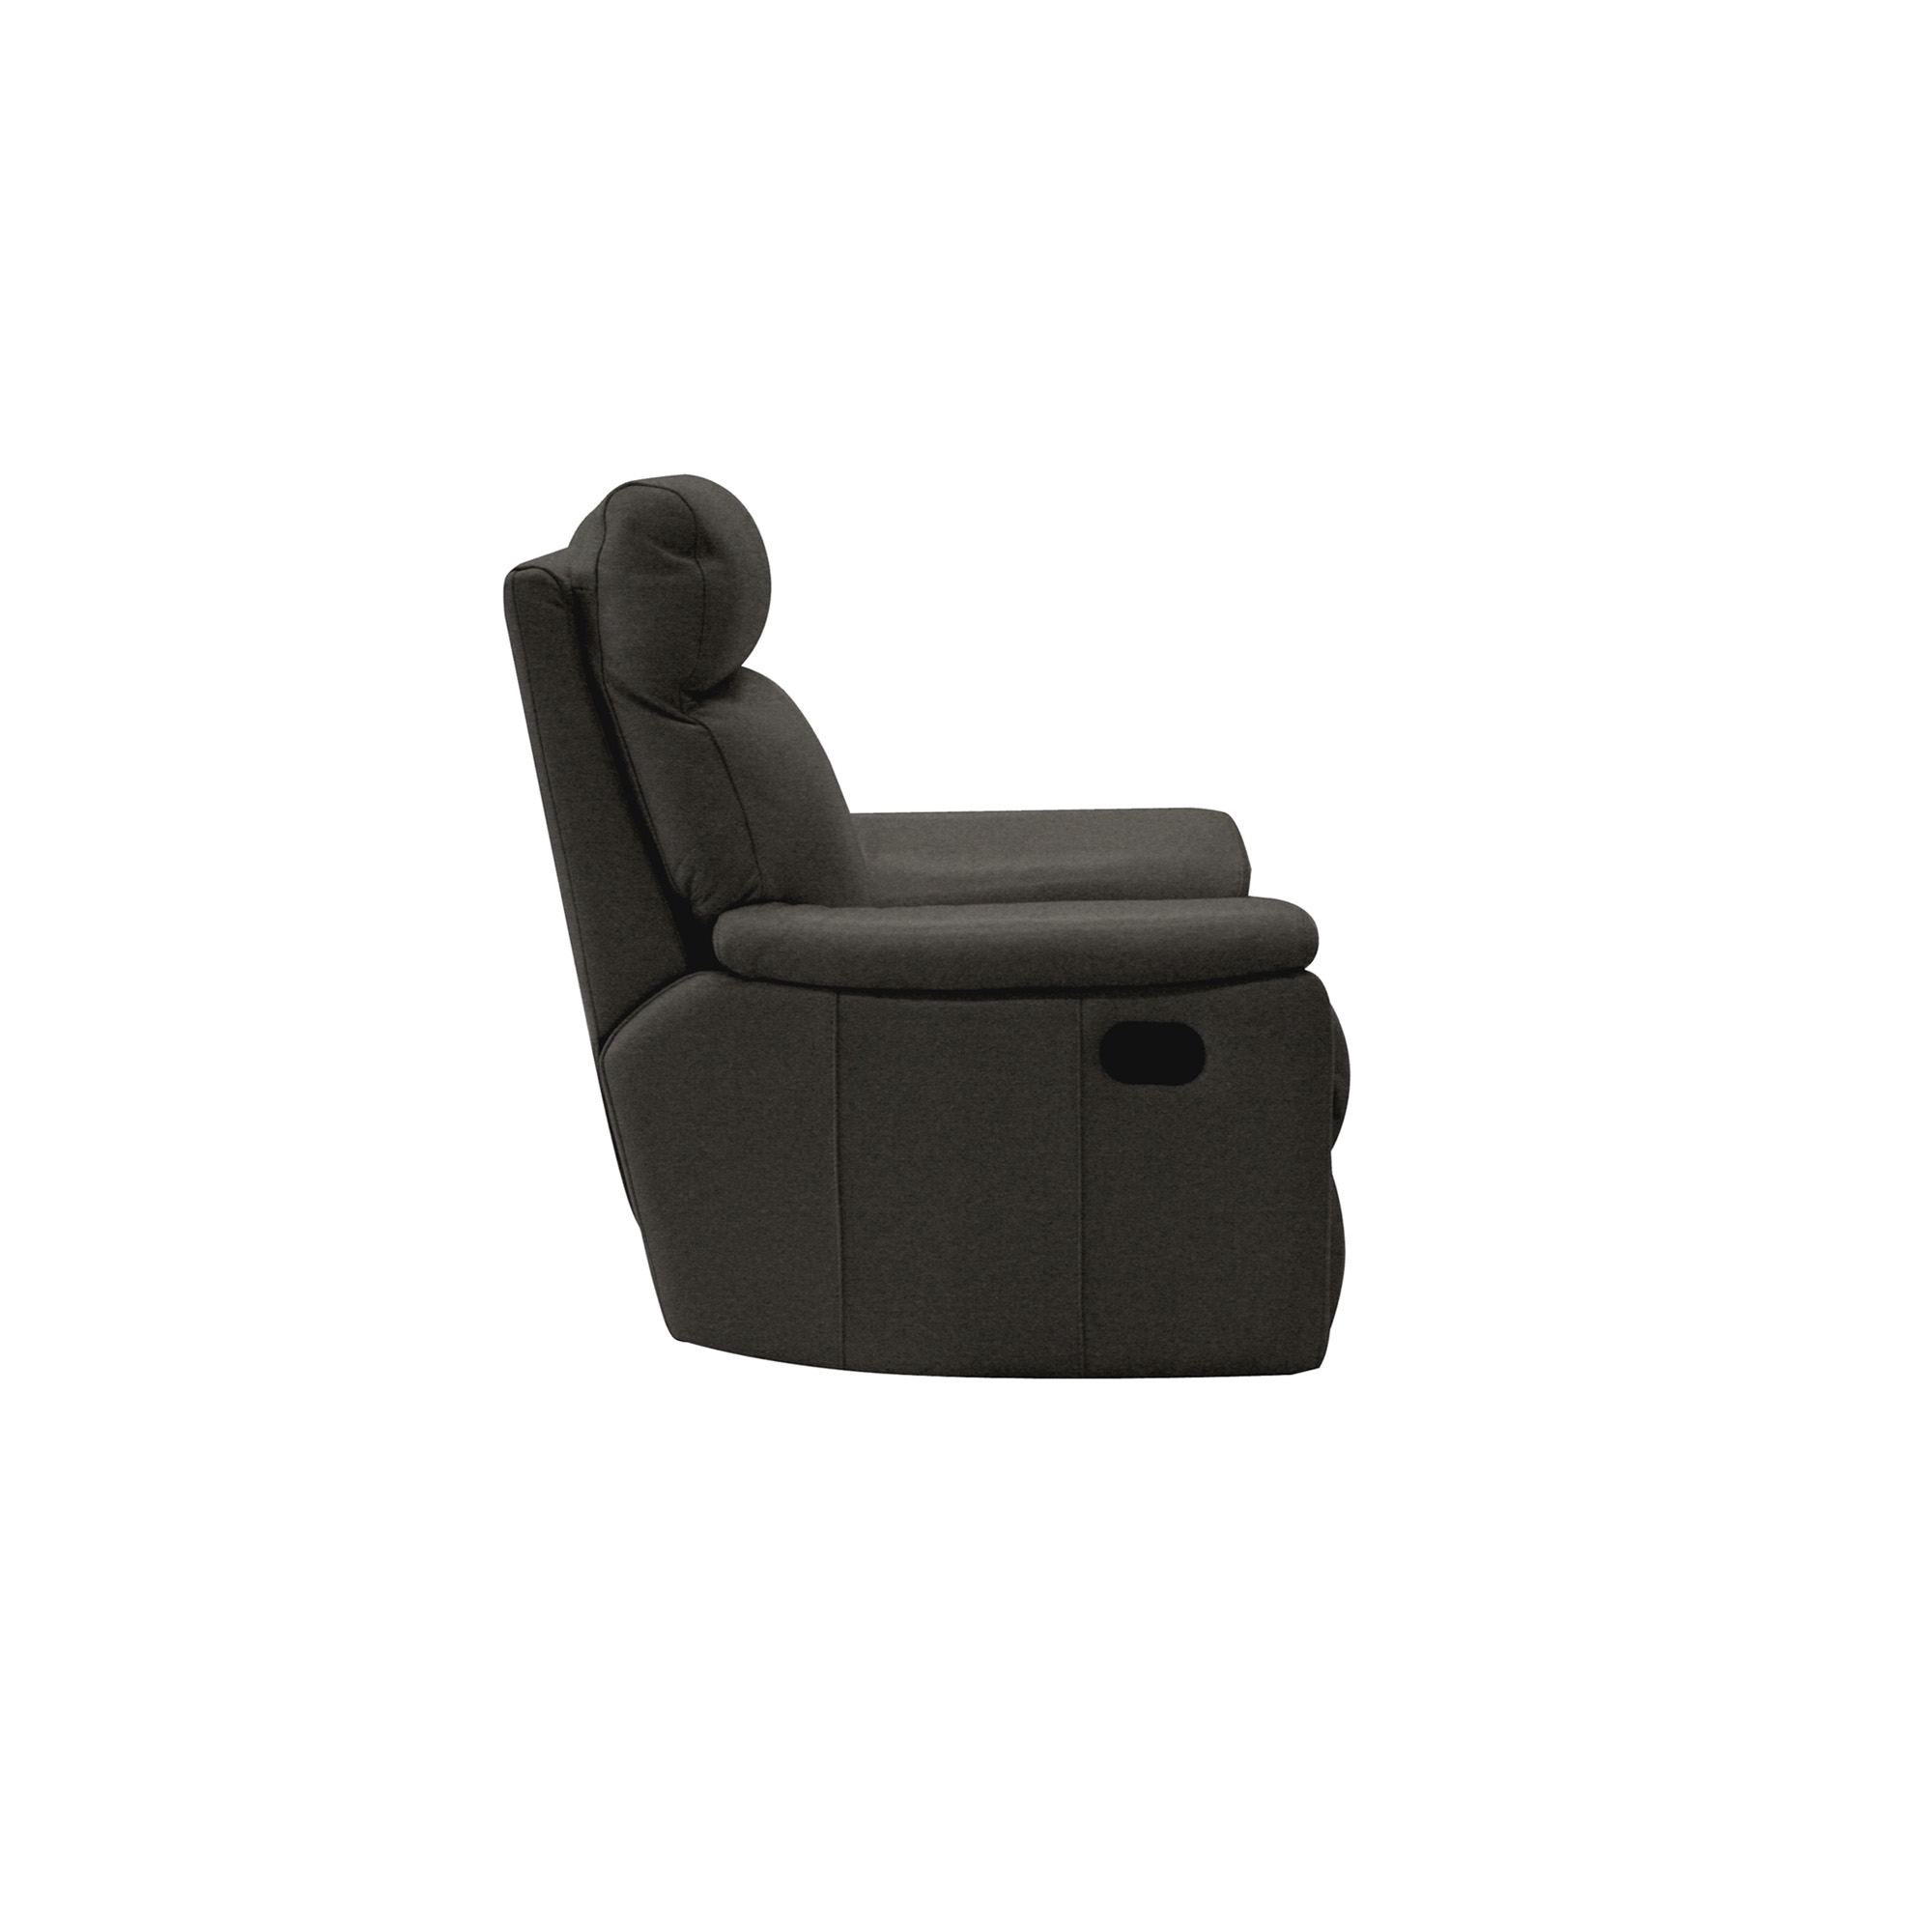 lightbox  sc 1 st  Moran Furniture & Pilot Recliner - Moran Furniture islam-shia.org